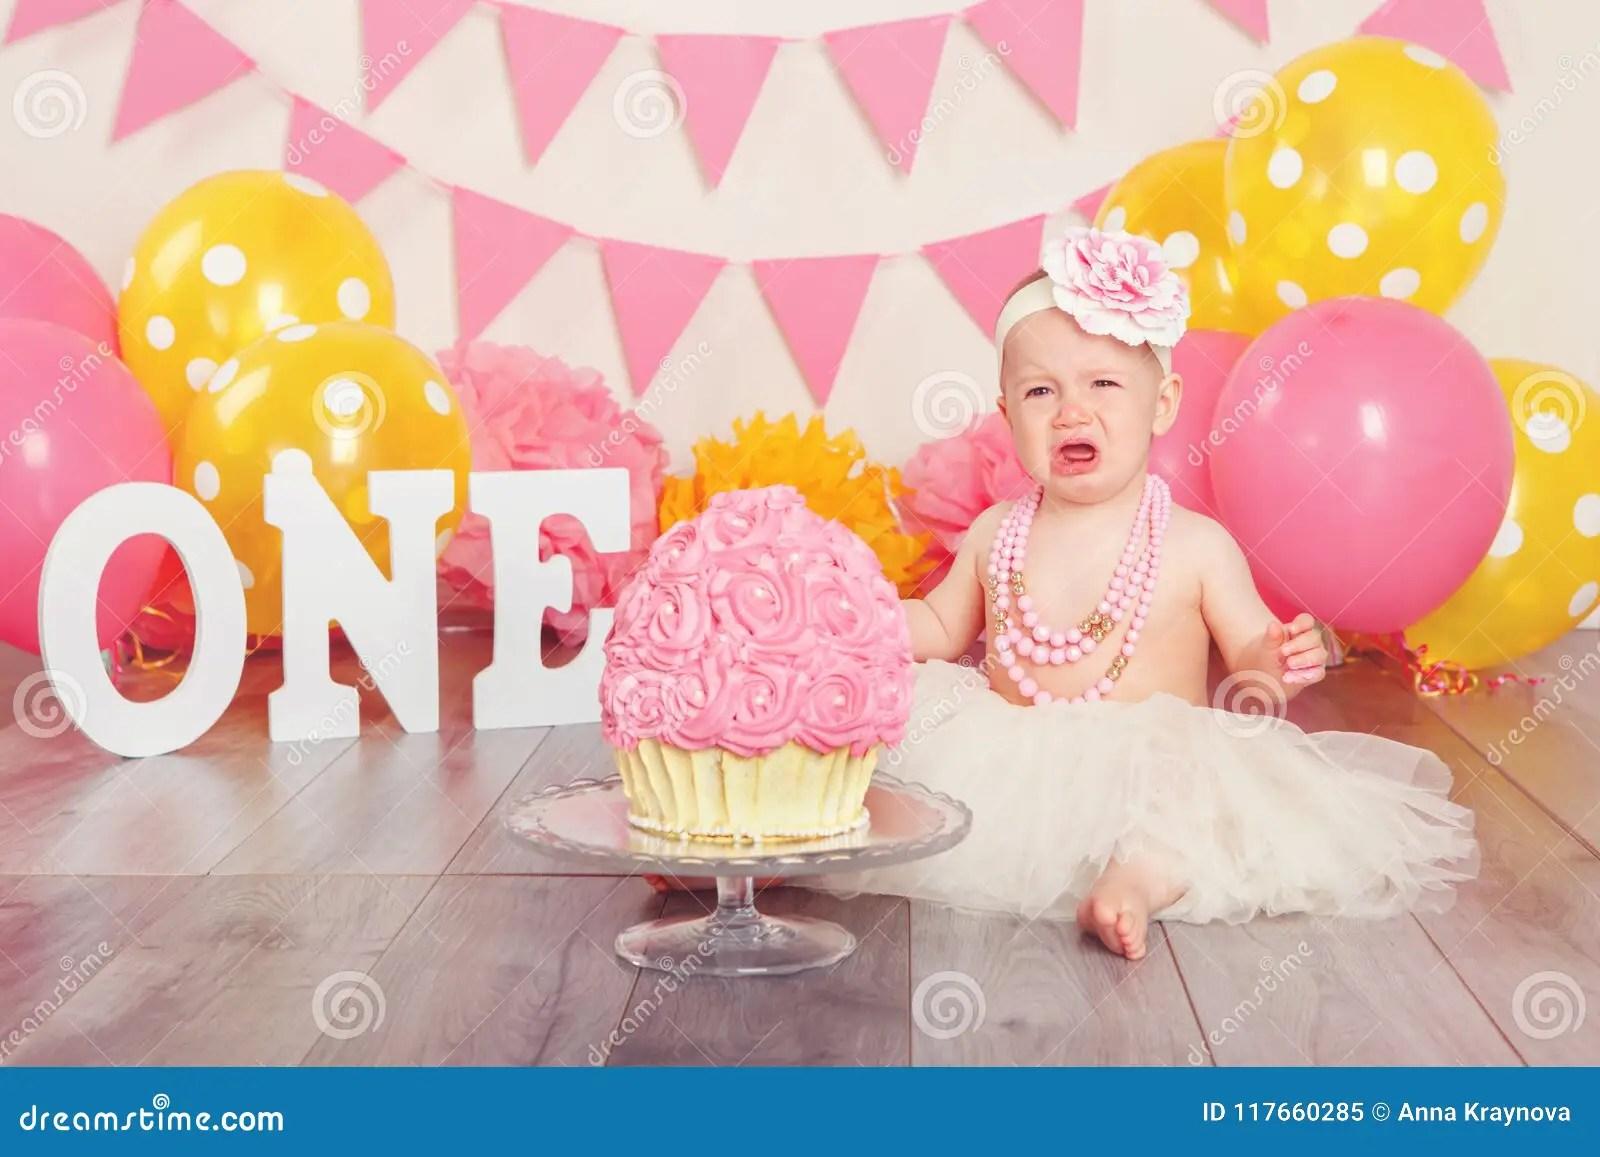 Caucasian Baby Girl In Tutu Tulle Skirt Celebrating Her First Birthday Cake Smash Concept Stock Image Image Of Eating Pink 117660285